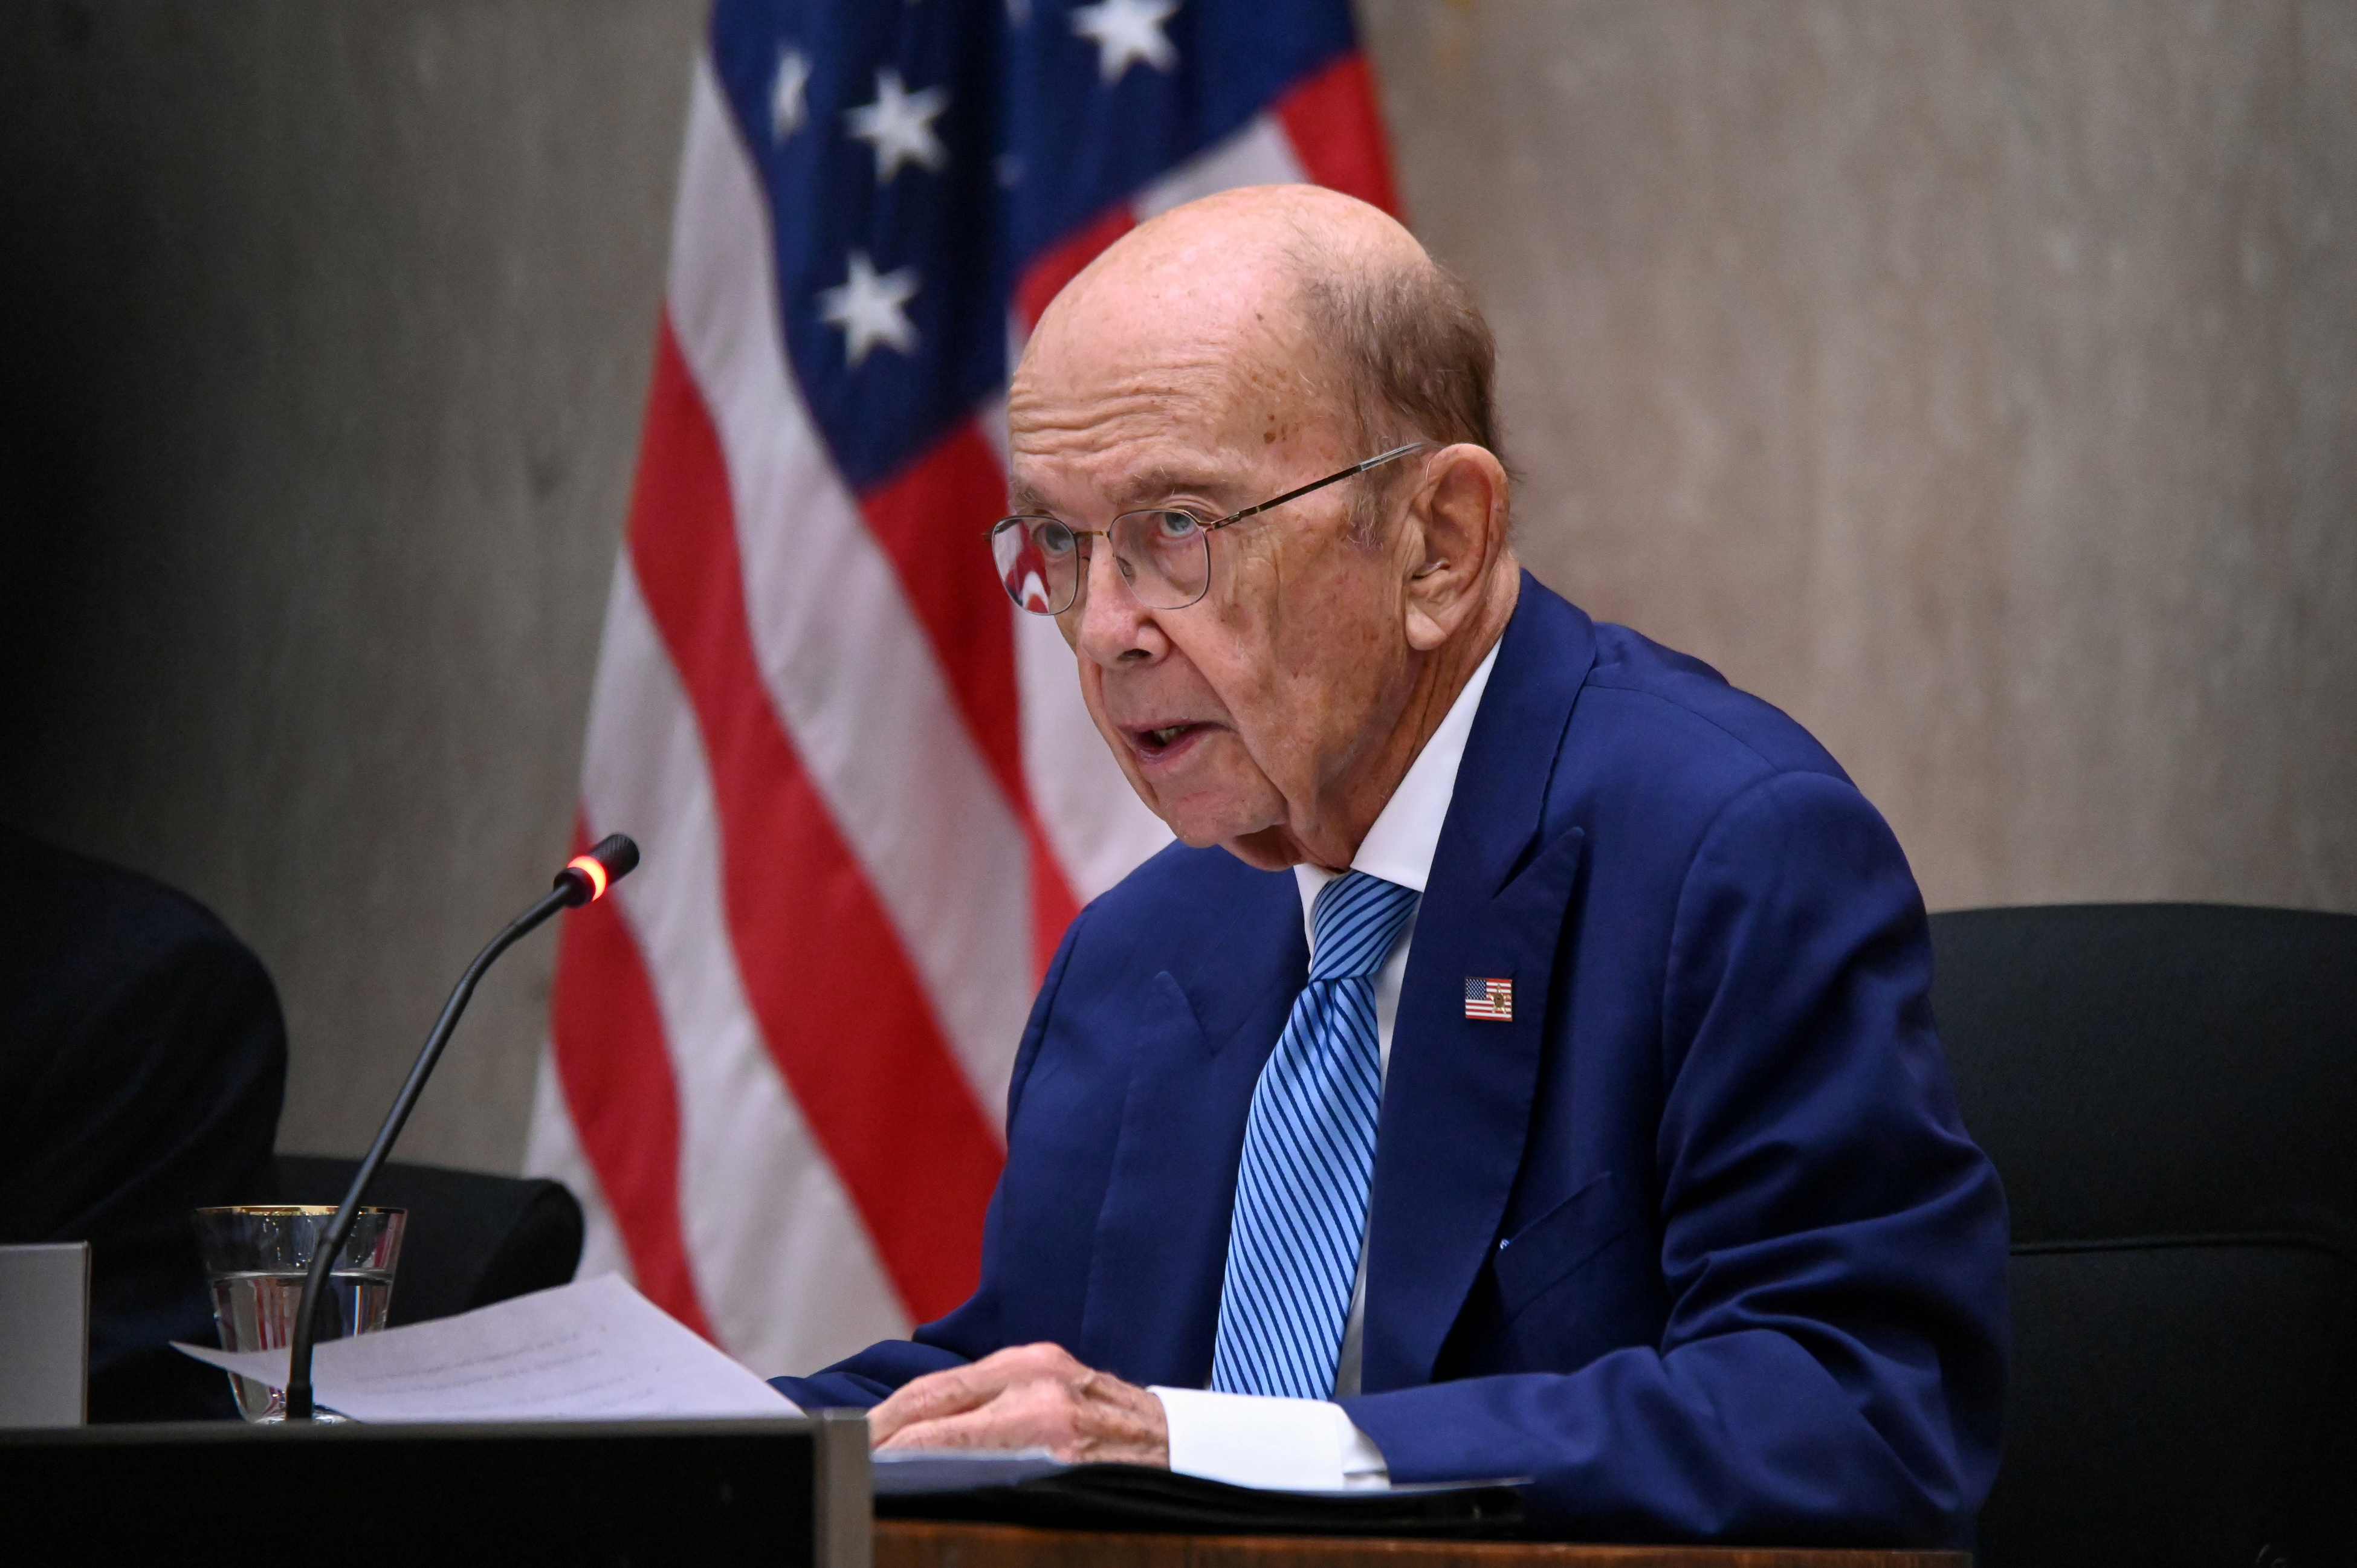 U.S. Commerce Secretary Wilbur Ross speaks during the third annual U.S.-Qatar Strategic Dialogue at the State Department in Washington, U.S., September 14, 2020. REUTERS/Erin Scott/Pool/File Photo